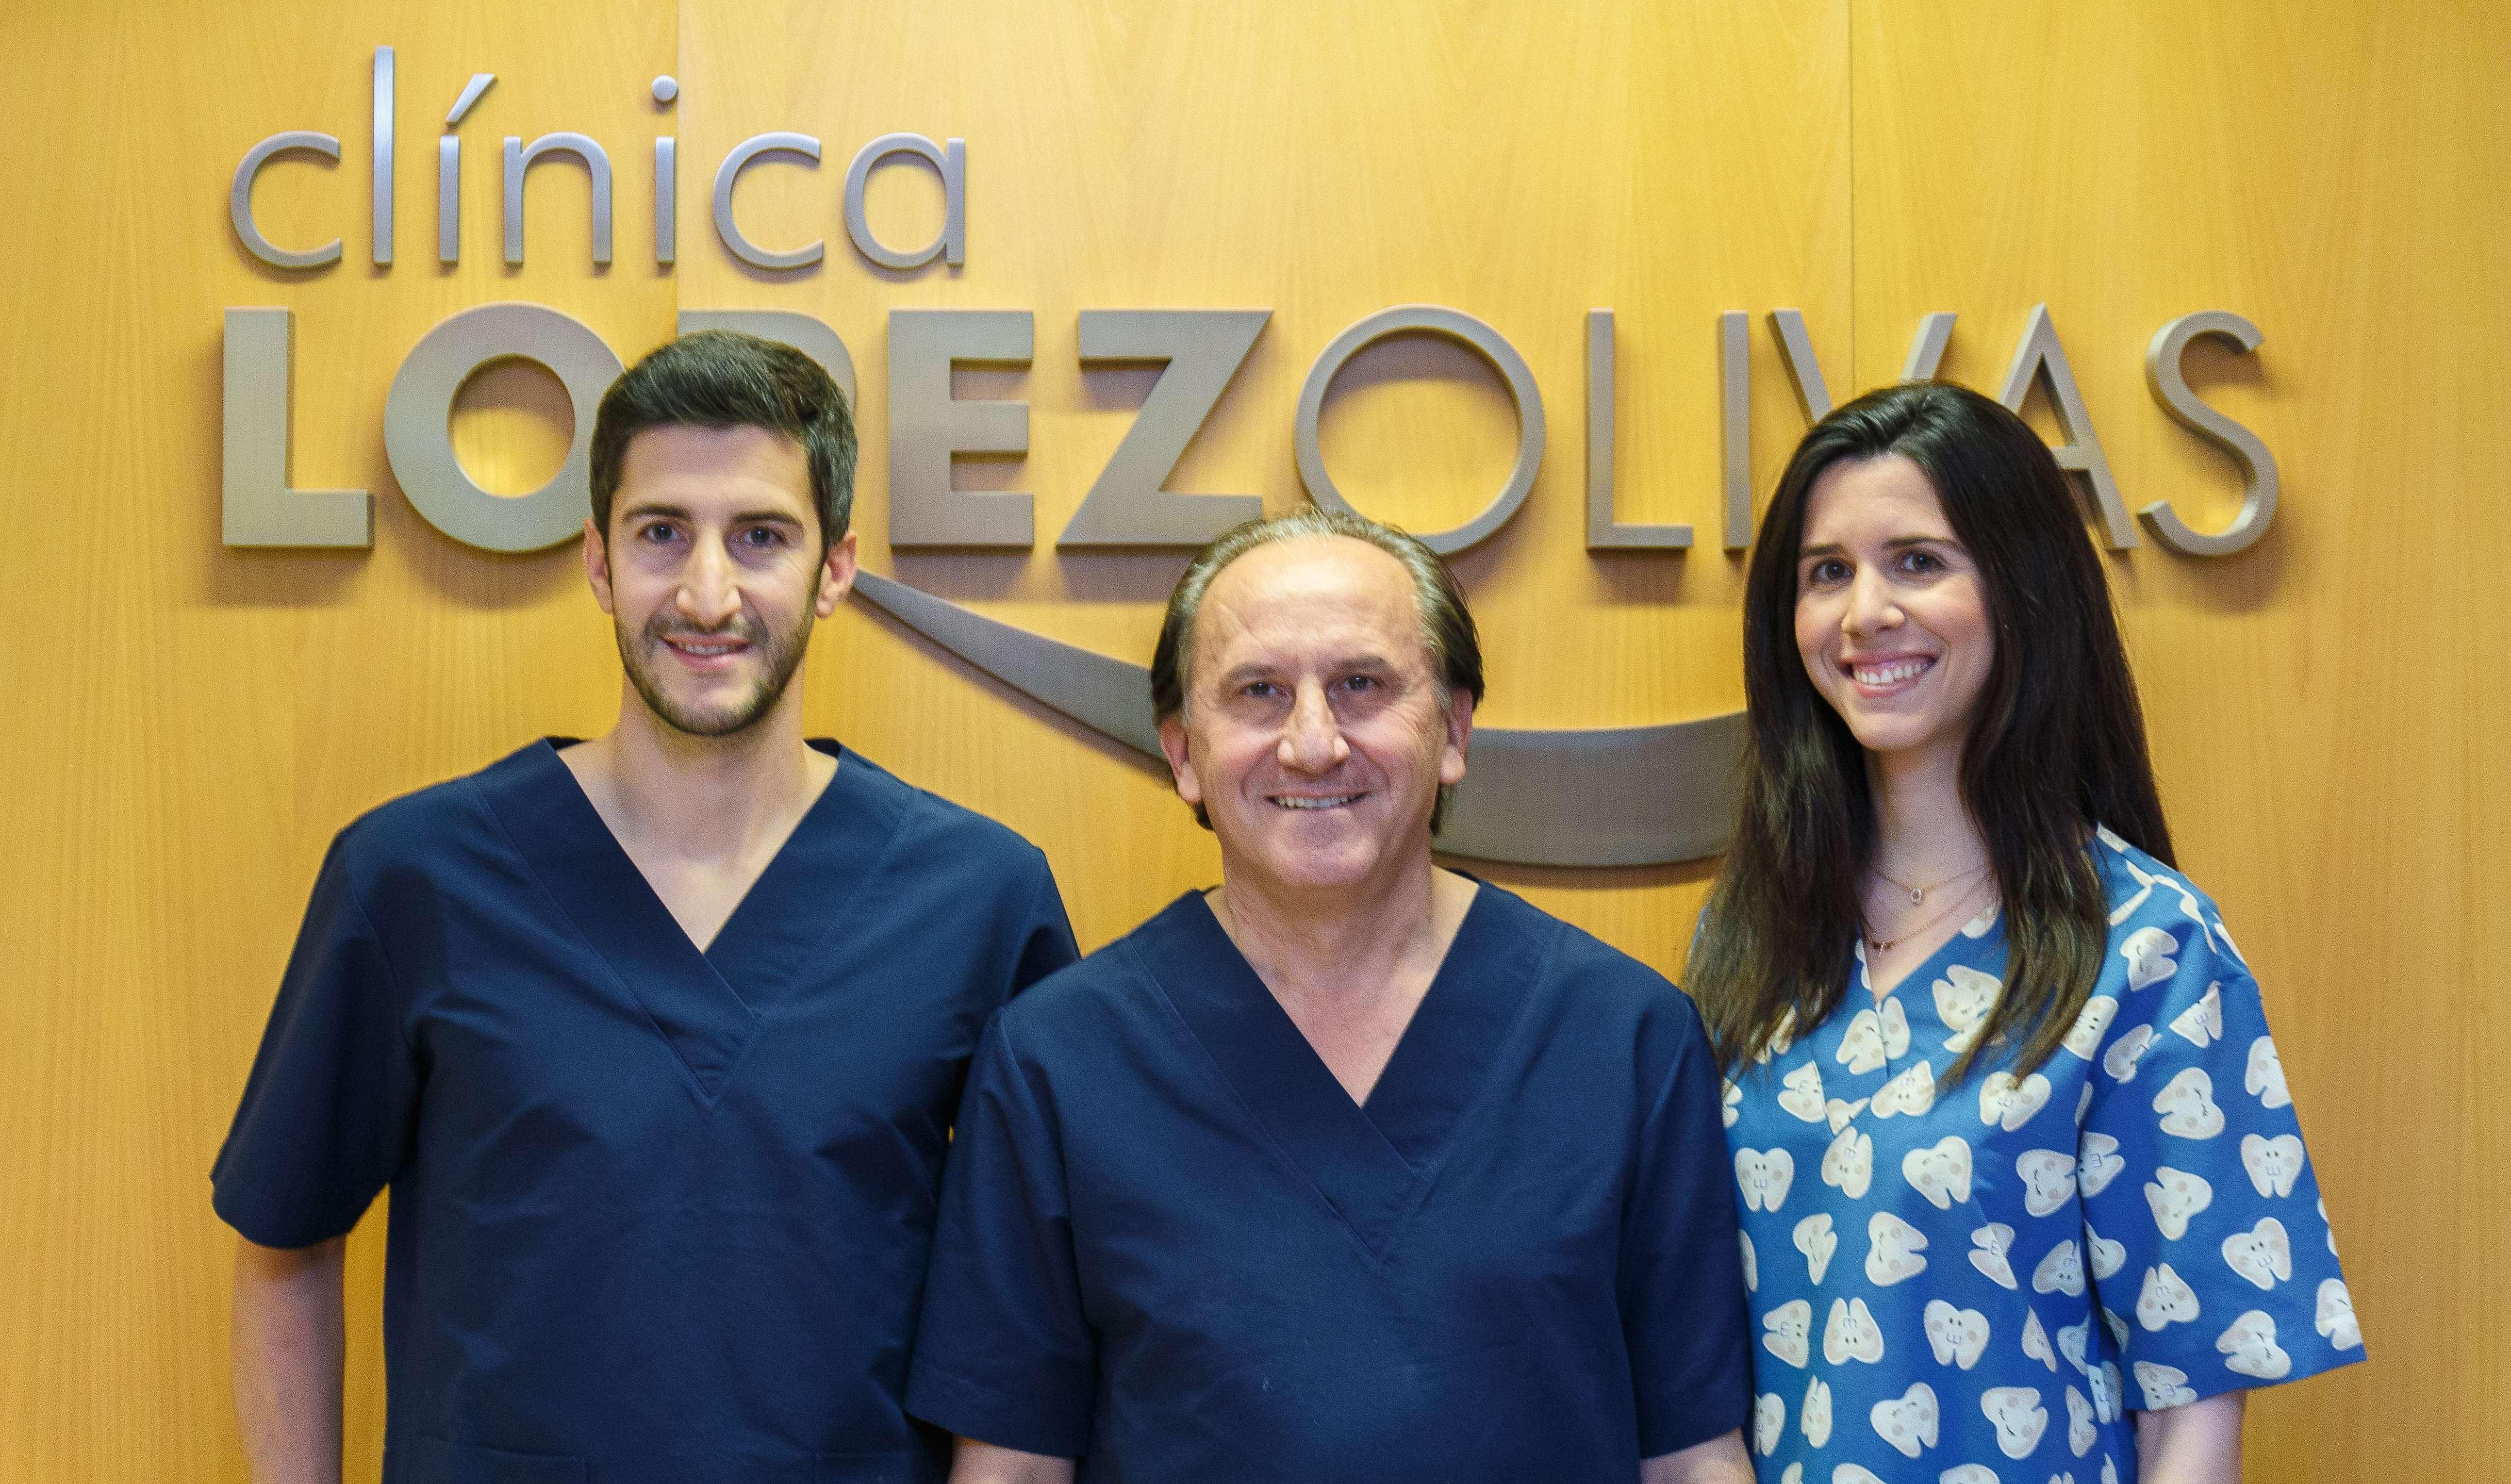 Dr. Lopez Olivas e hijos